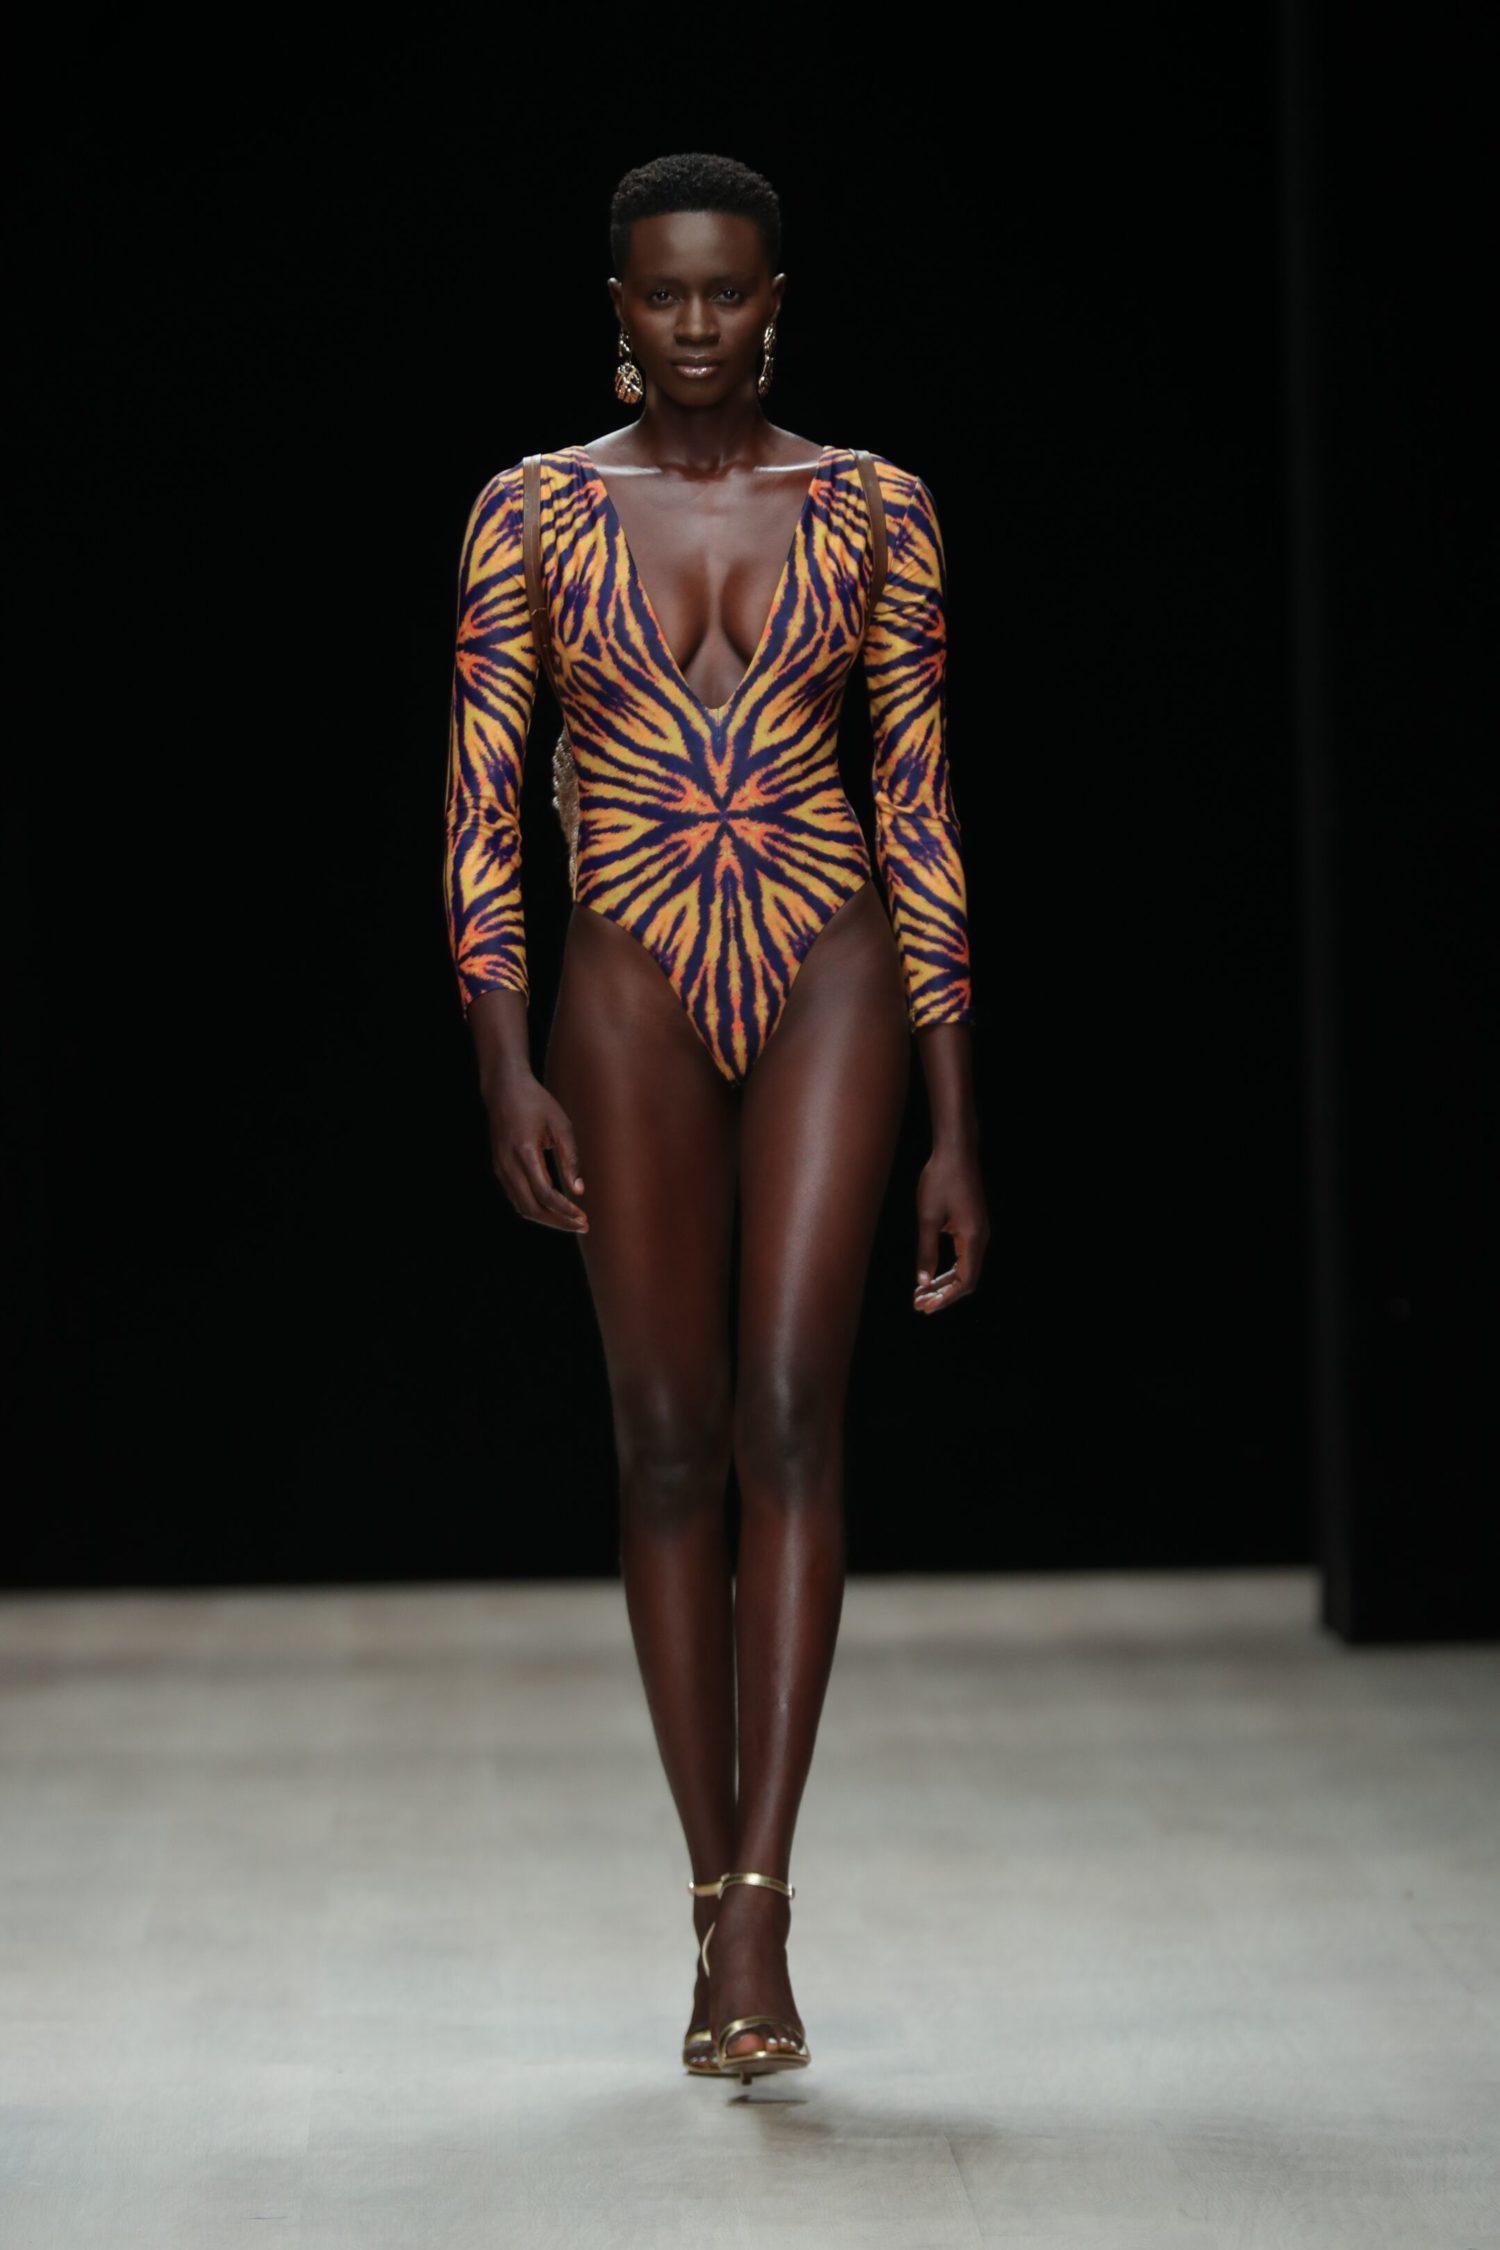 ARISE Fashion Week 2019 | Andrea Iyamah